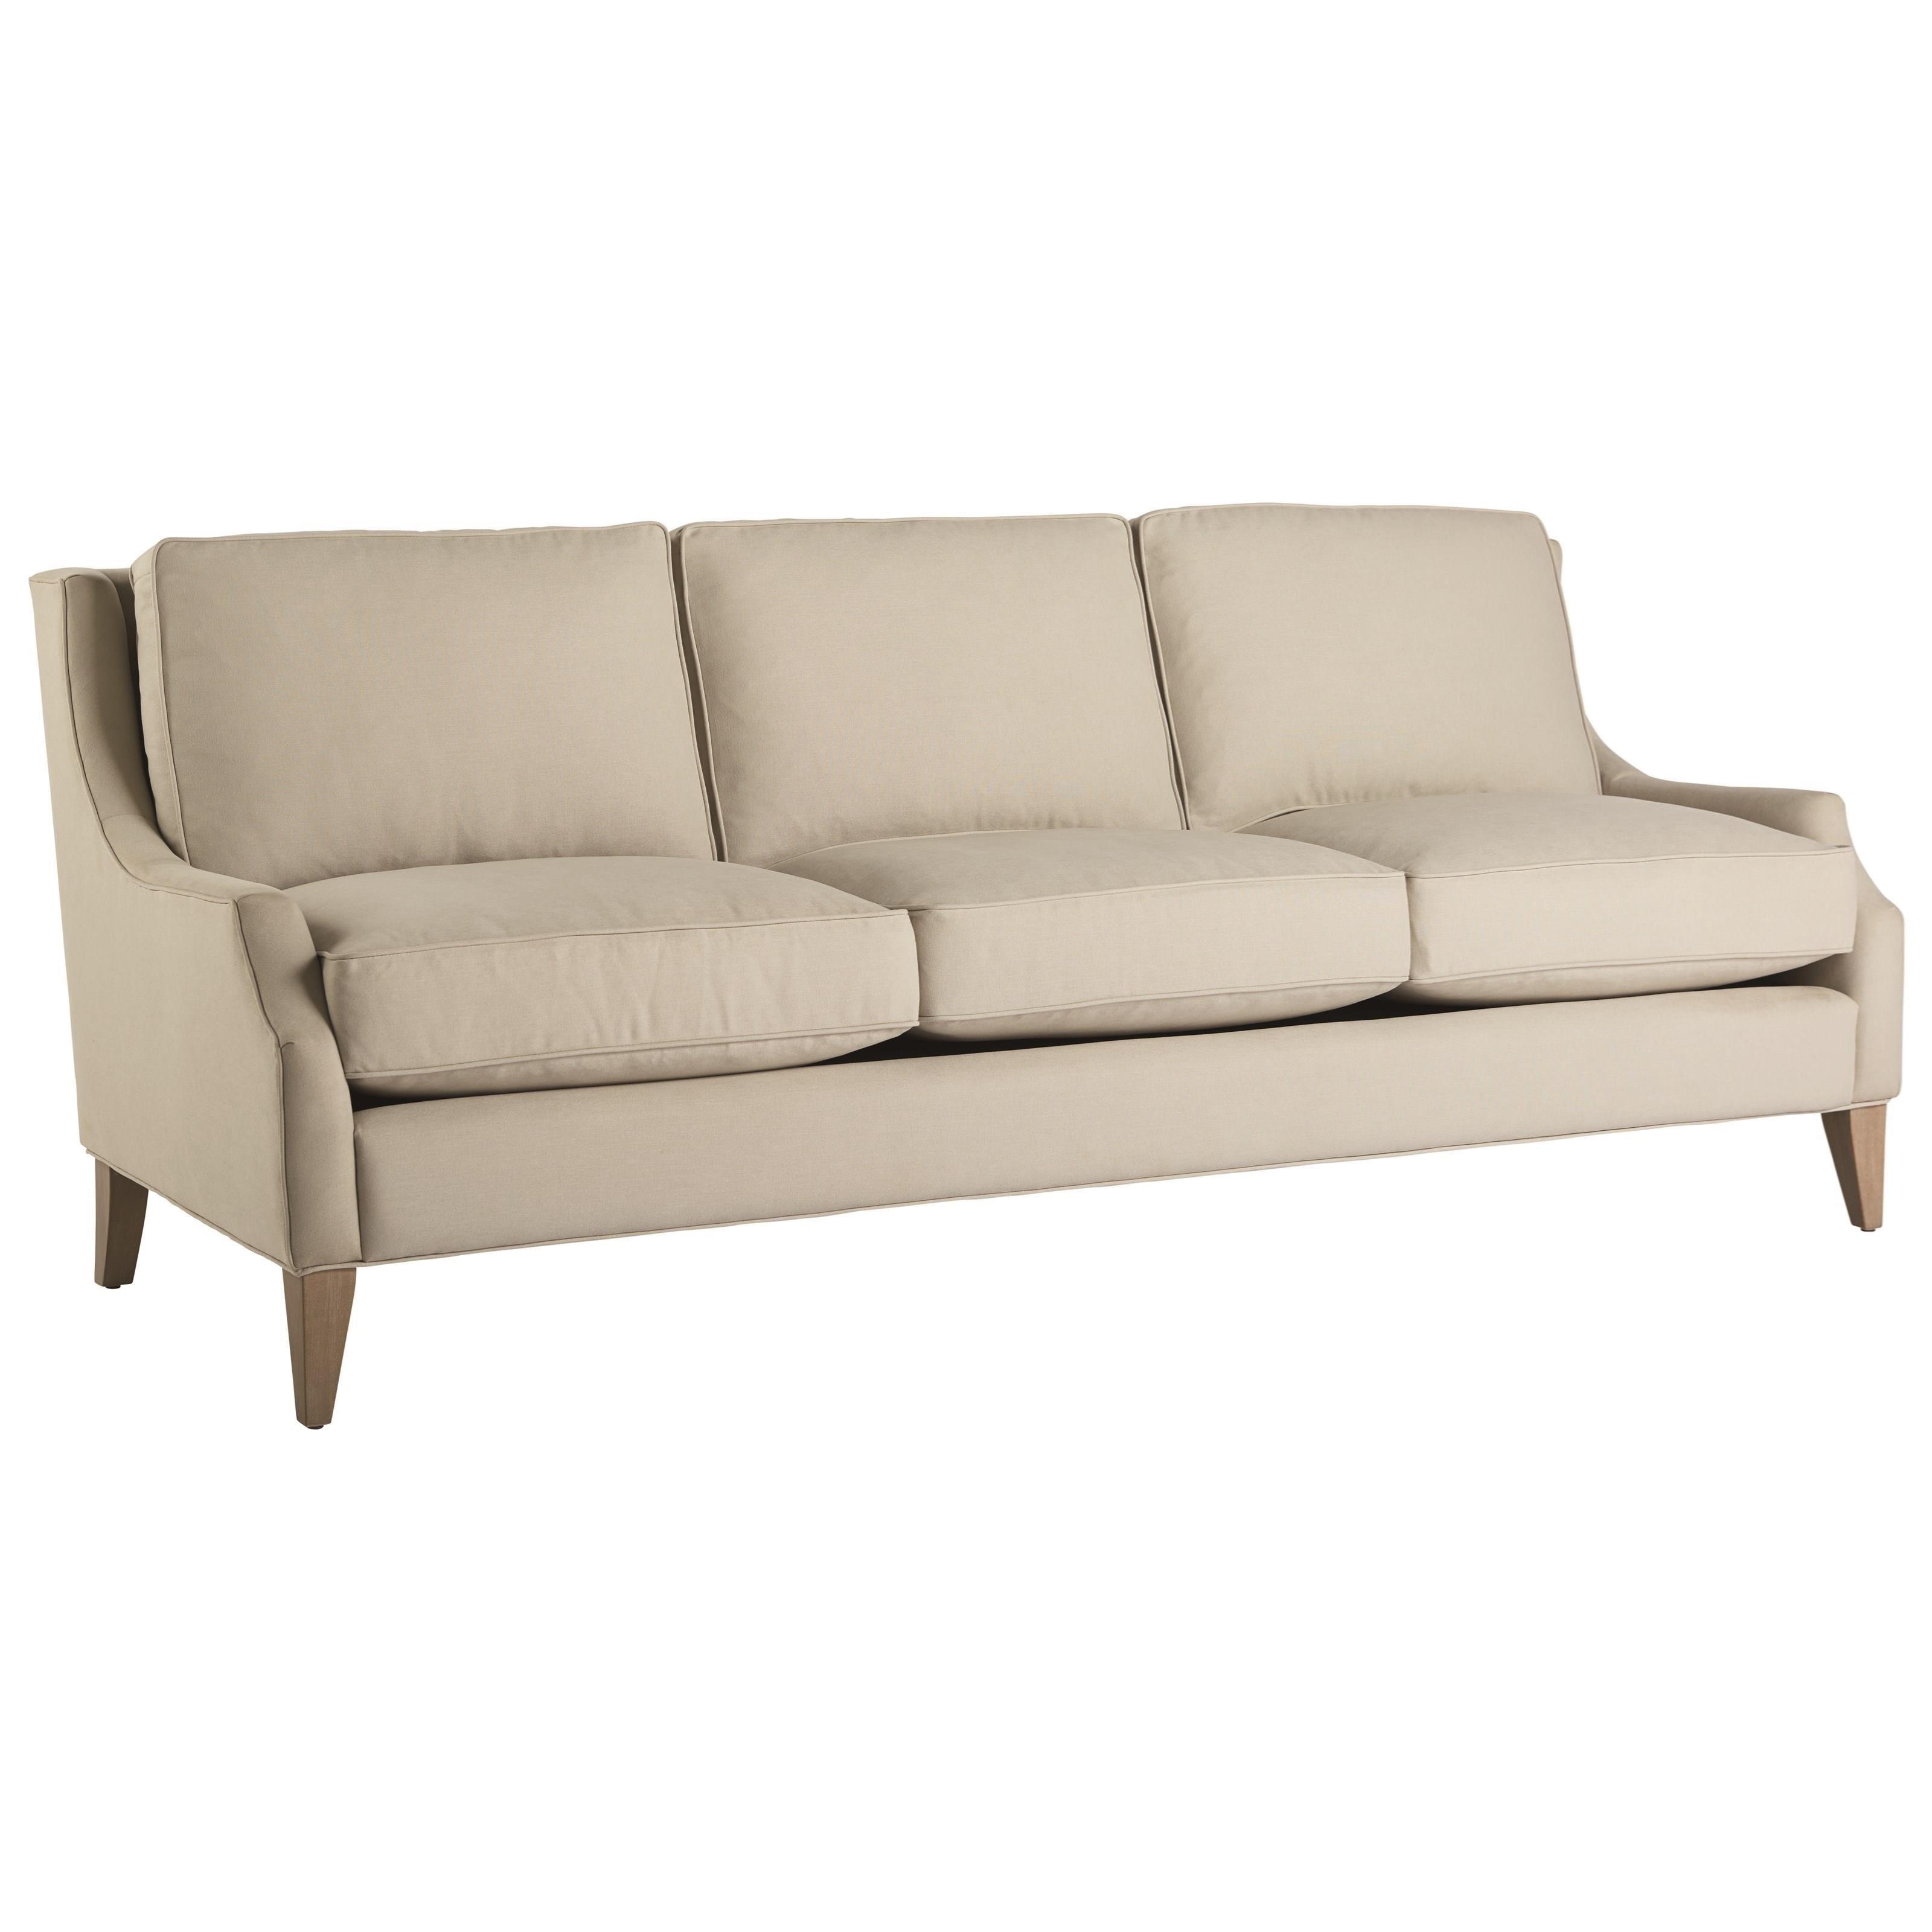 Love. Joy. Bliss.-Miranda Kerr Home Manhattan Sofa by Universal at Baer's Furniture